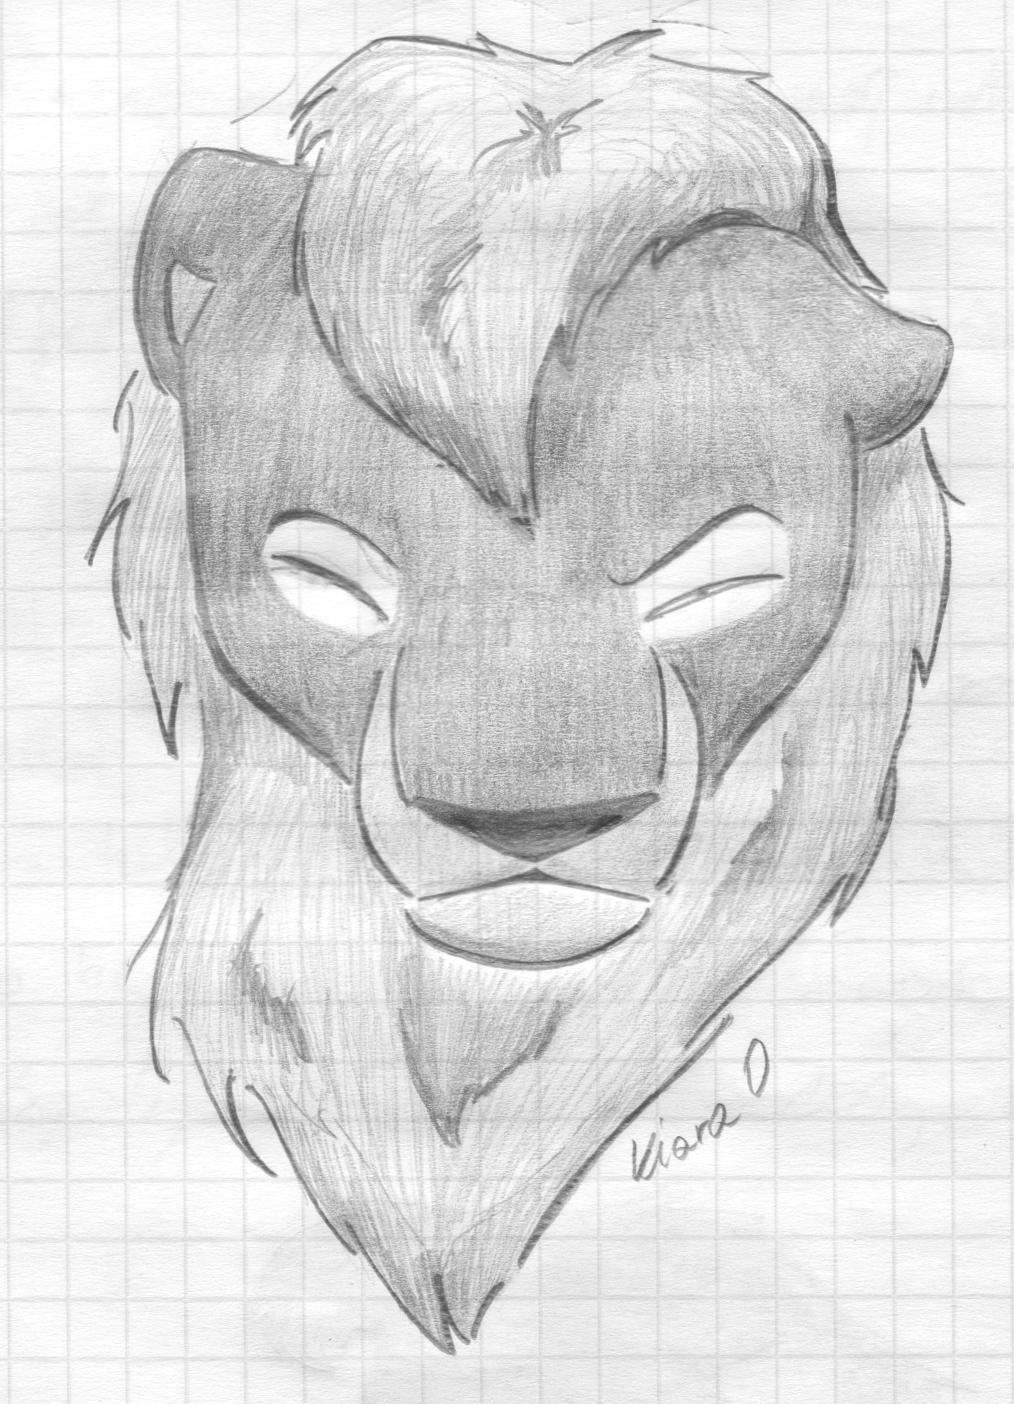 random_lion_by_kiara0-d4995as.jpg